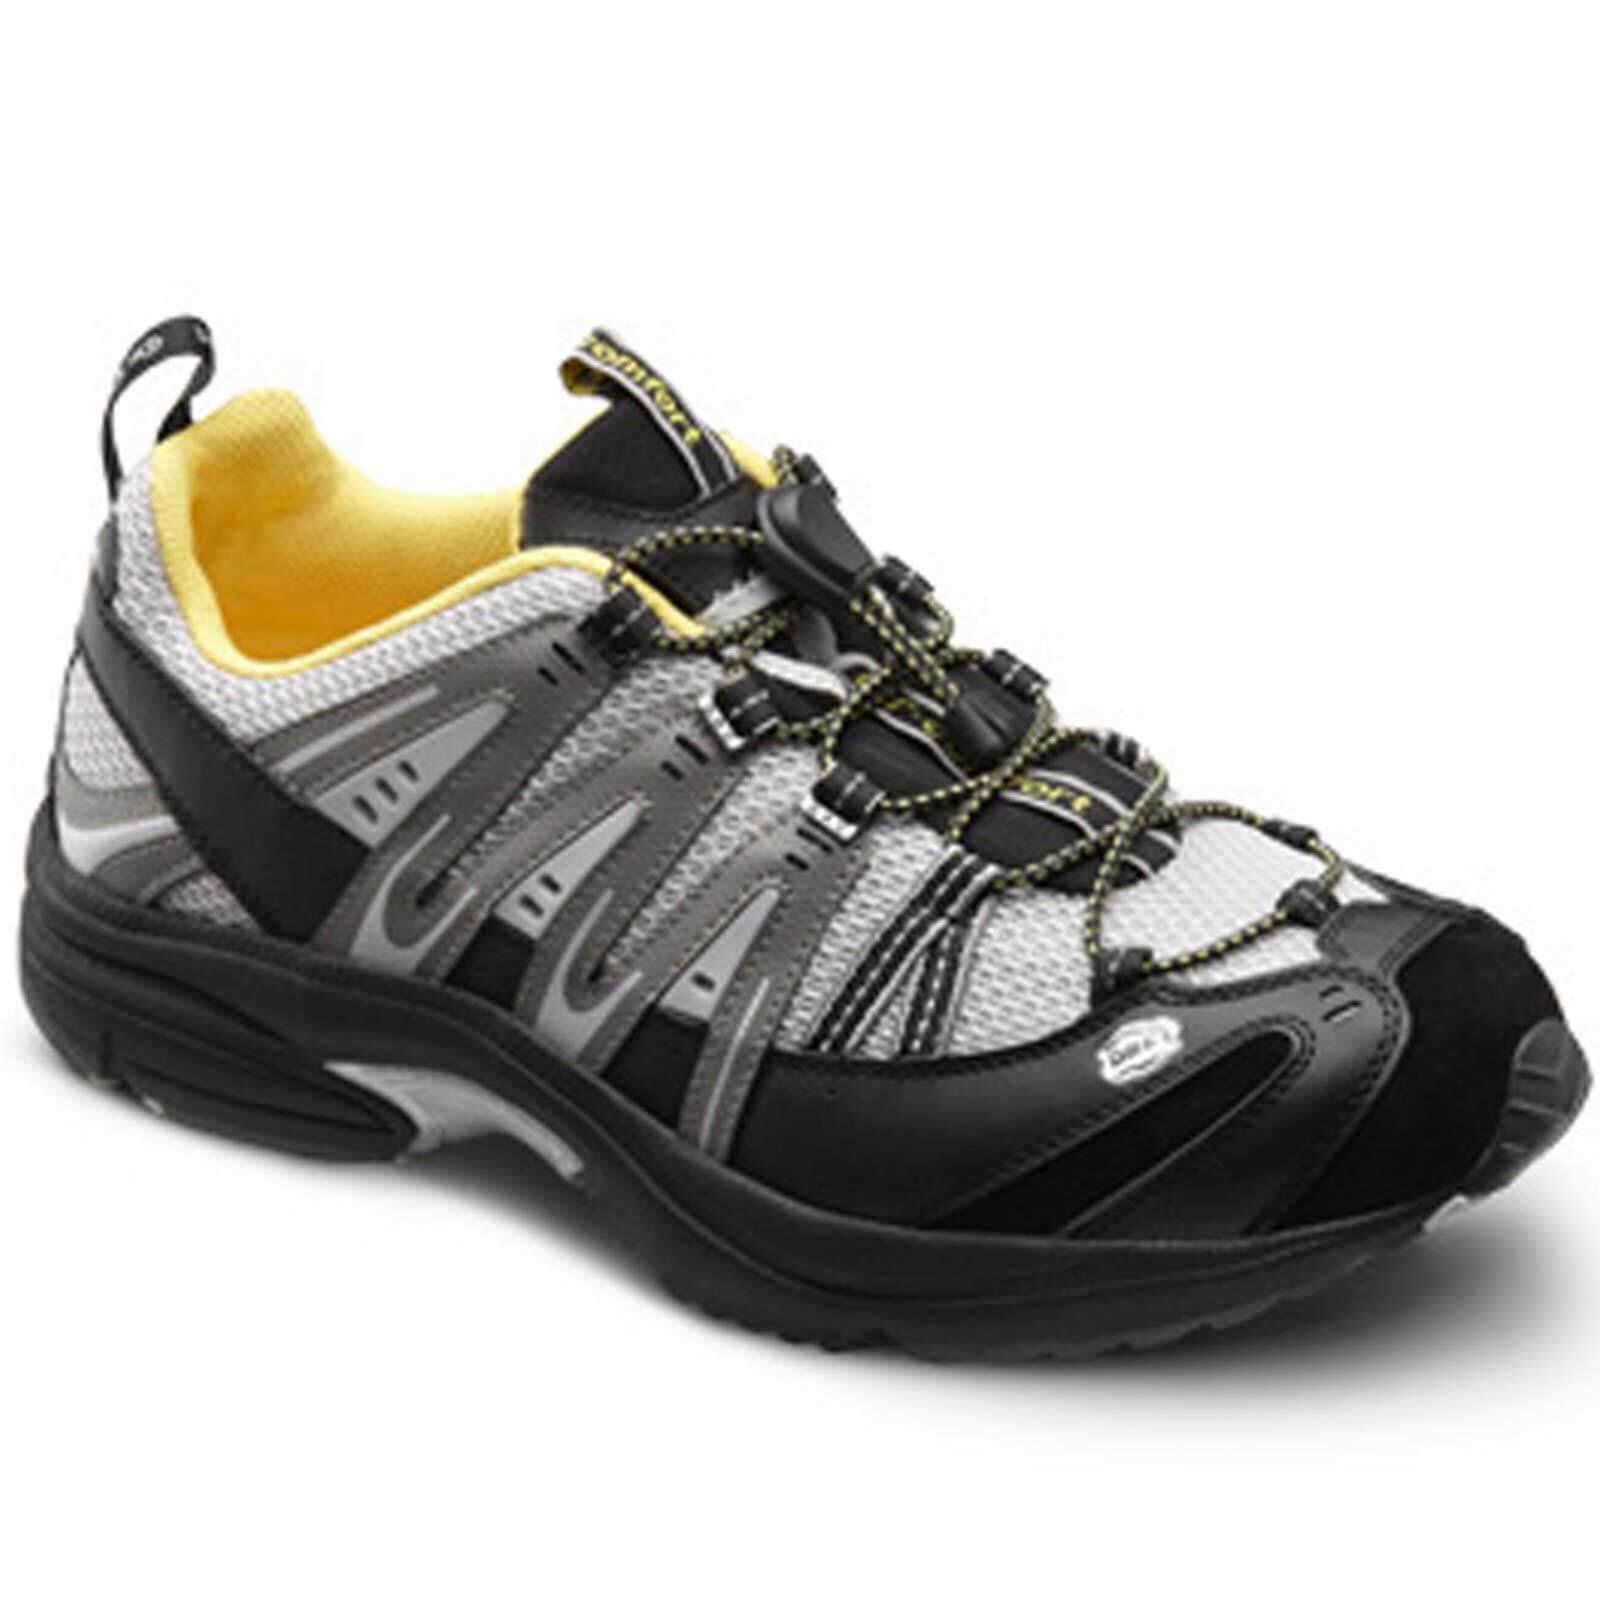 Dr Comfort Performance Men's Therapeutic Diabetic Athletic ...